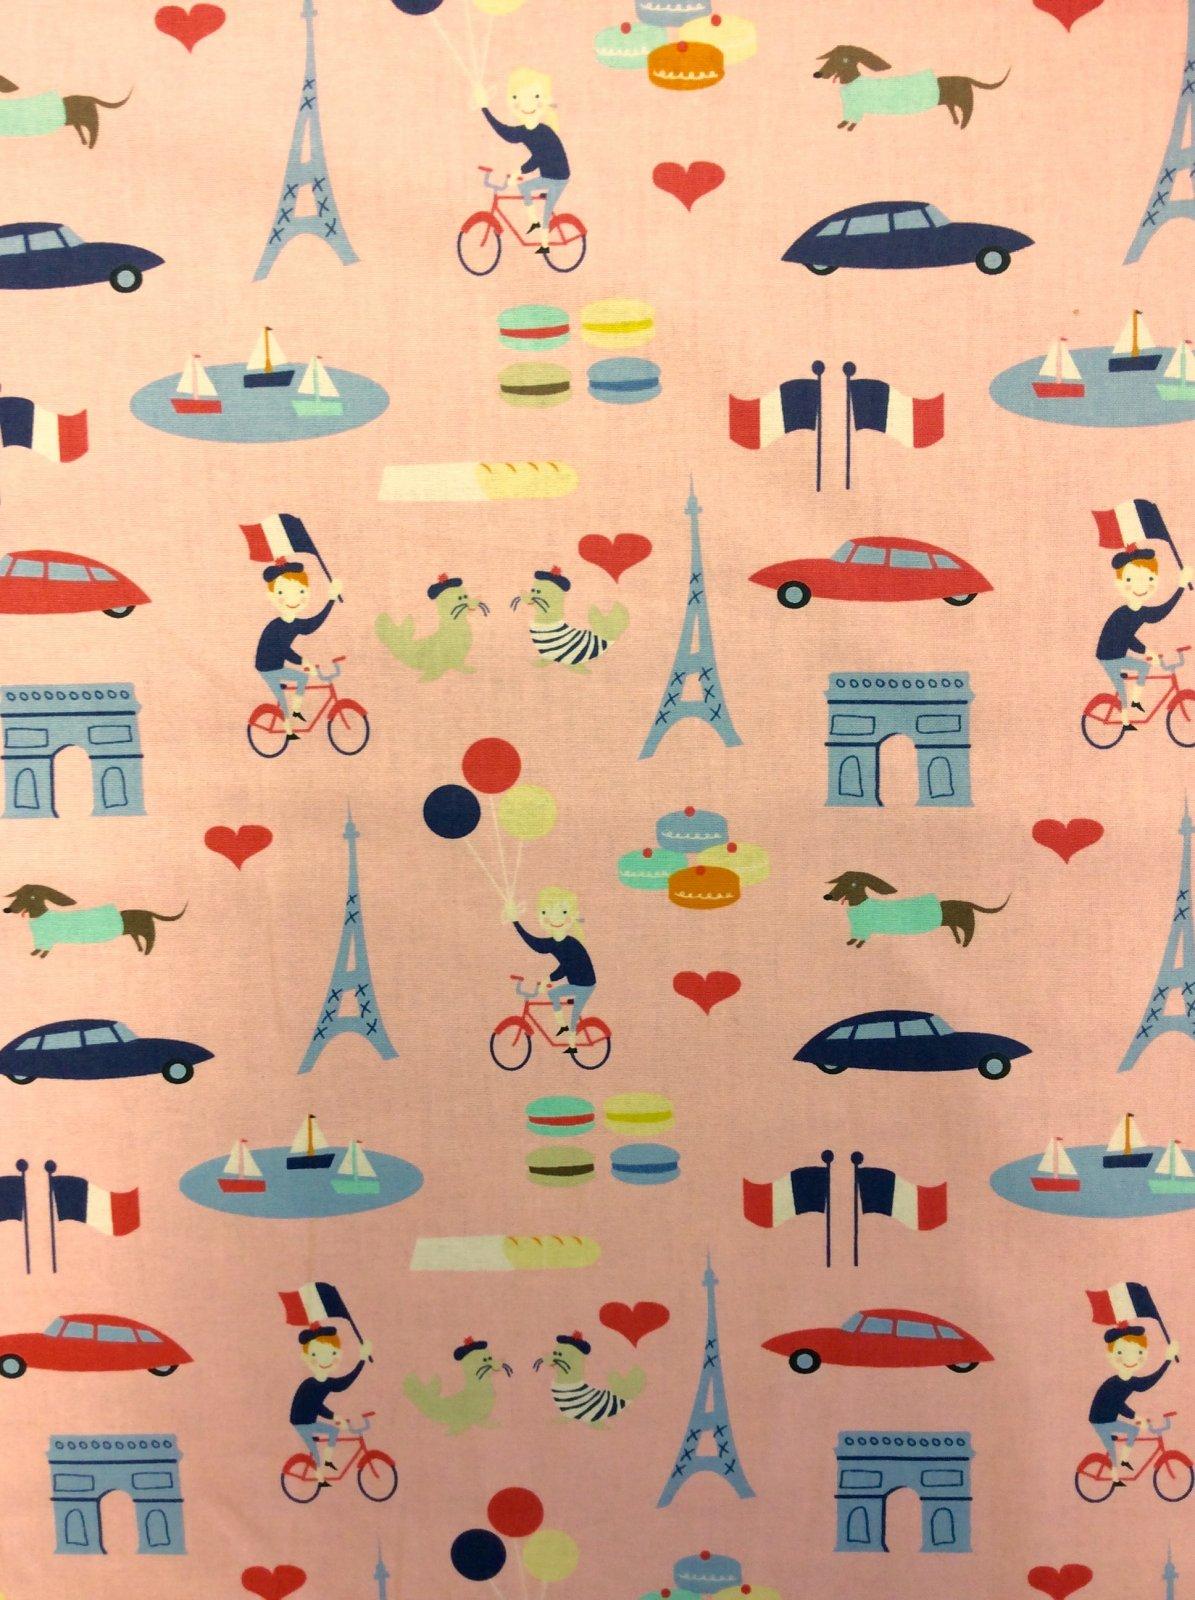 Paris France Retro French Street Scenes Eiffel Tower Bicycles Tourist Travel Cotton Quilt Fabric FT134